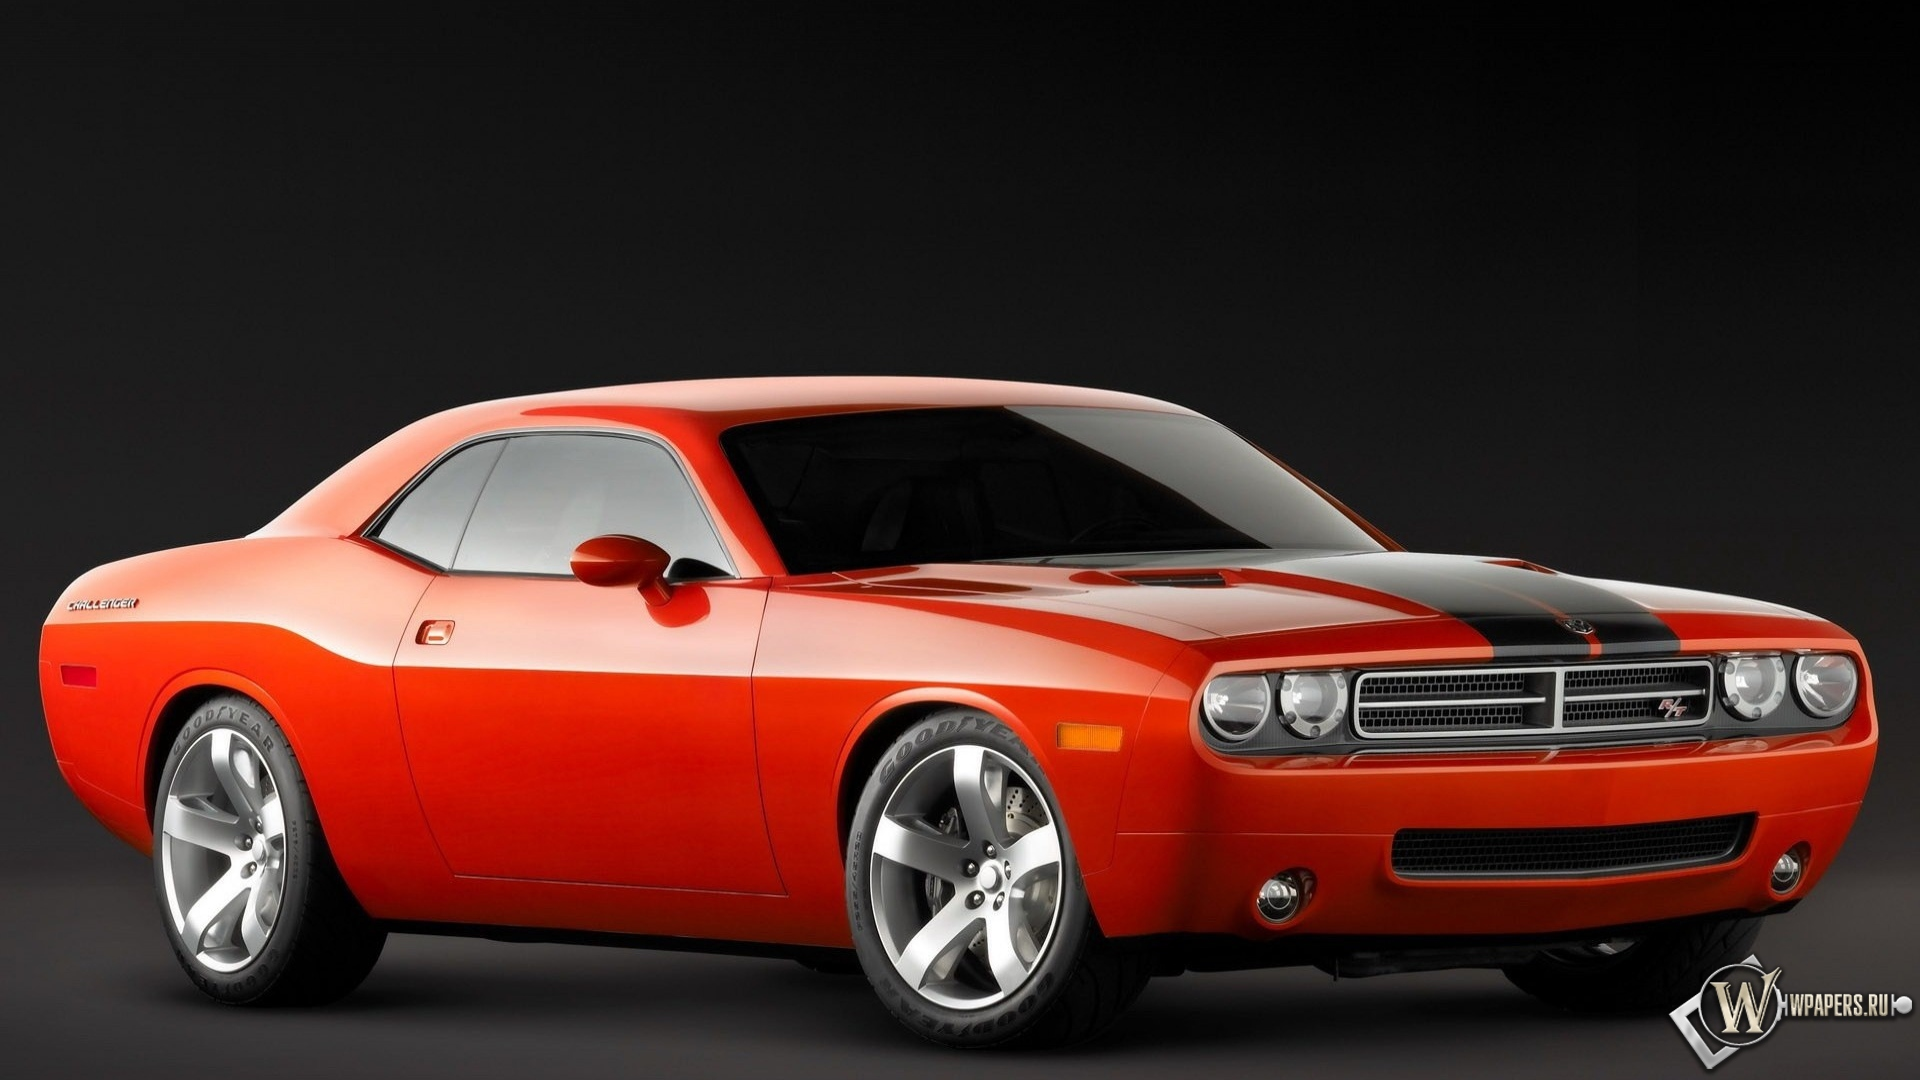 Красный Dodge Challenger.